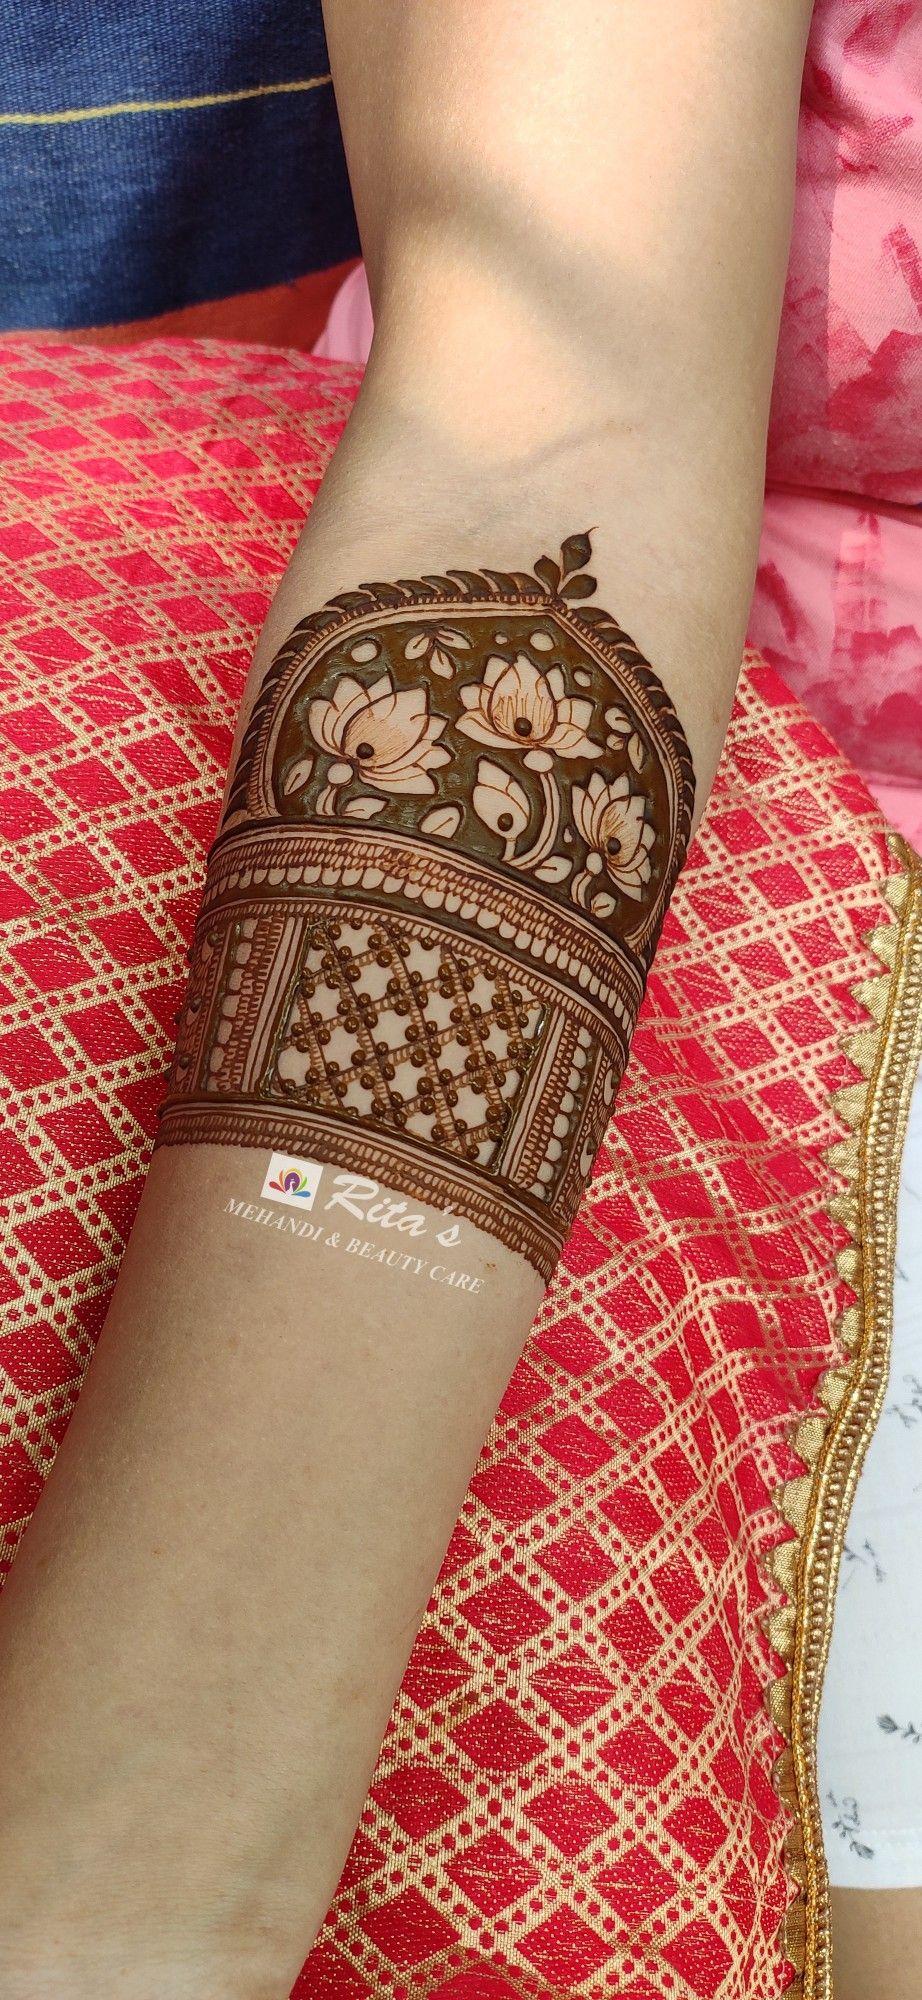 #Bridalmehendi #bridalhenna #henndesigns #mehendidesigns #hennabridal #bride #bridetobe #bridal #bridesofmumbai #bridesofindia #indianbride #elephantdesignhenna #floralmehendi #floralhenna